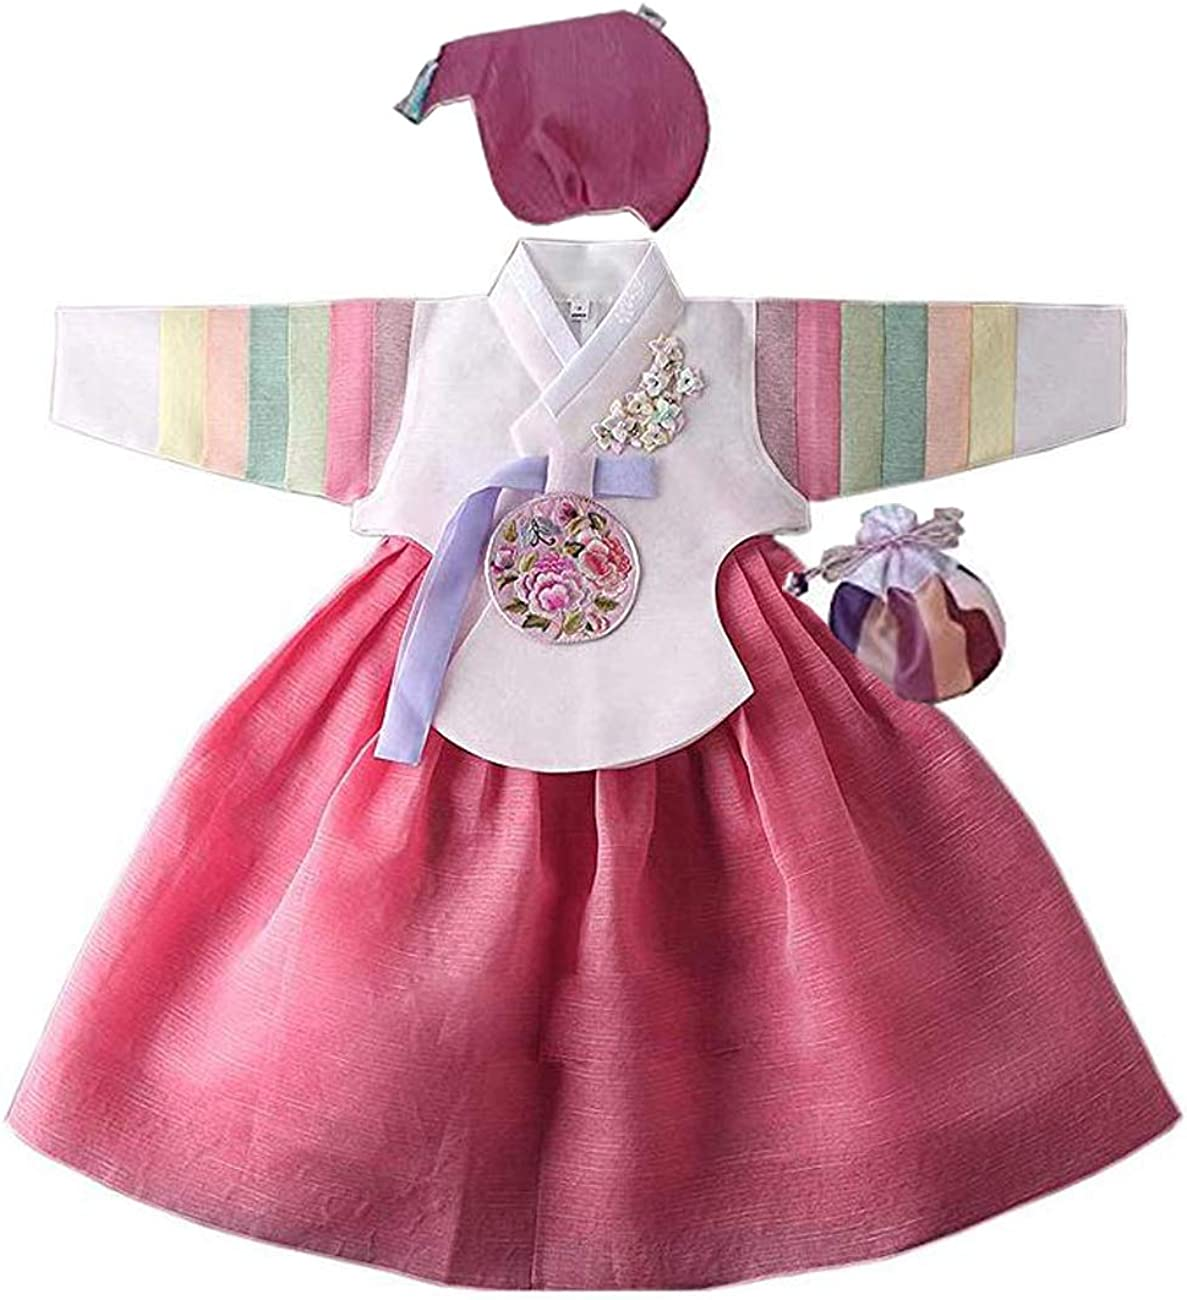 Korean hanbok girls baby traditional costumes dress 1st birthday Dolbok dol